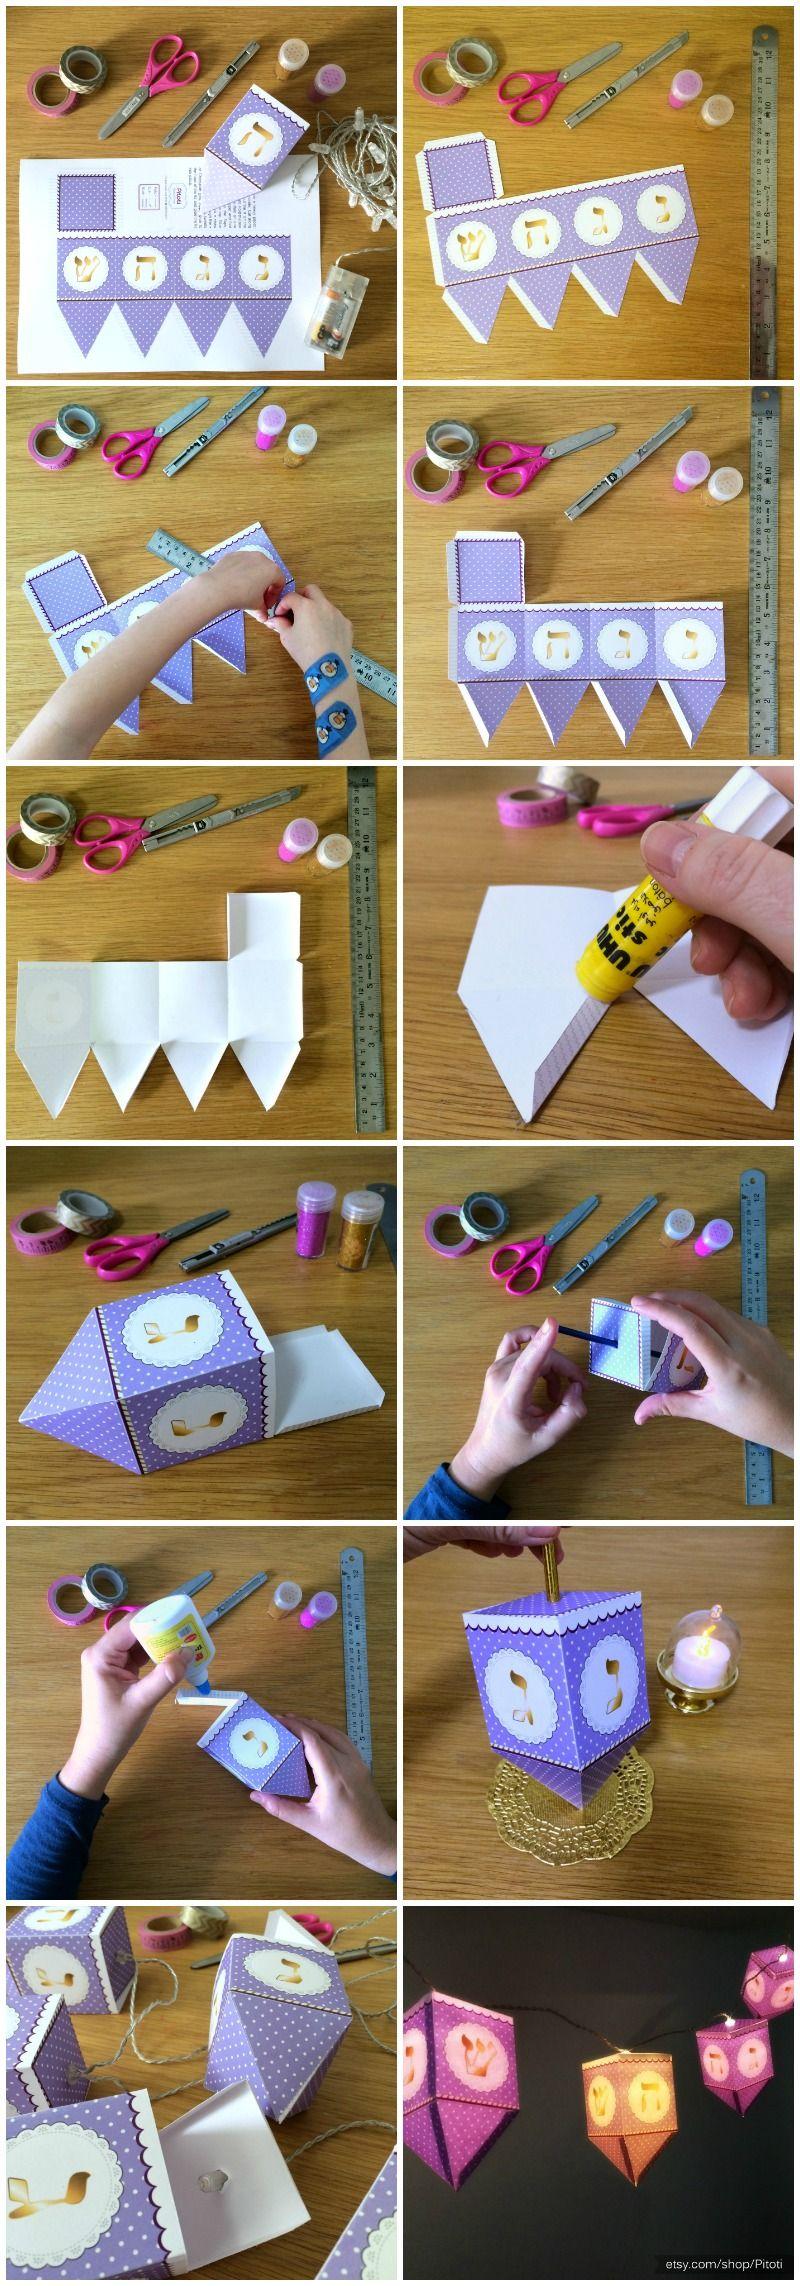 Dreidel Template | Hanukkah Dreidel Printable Dreidel Template To Create 3d Paper